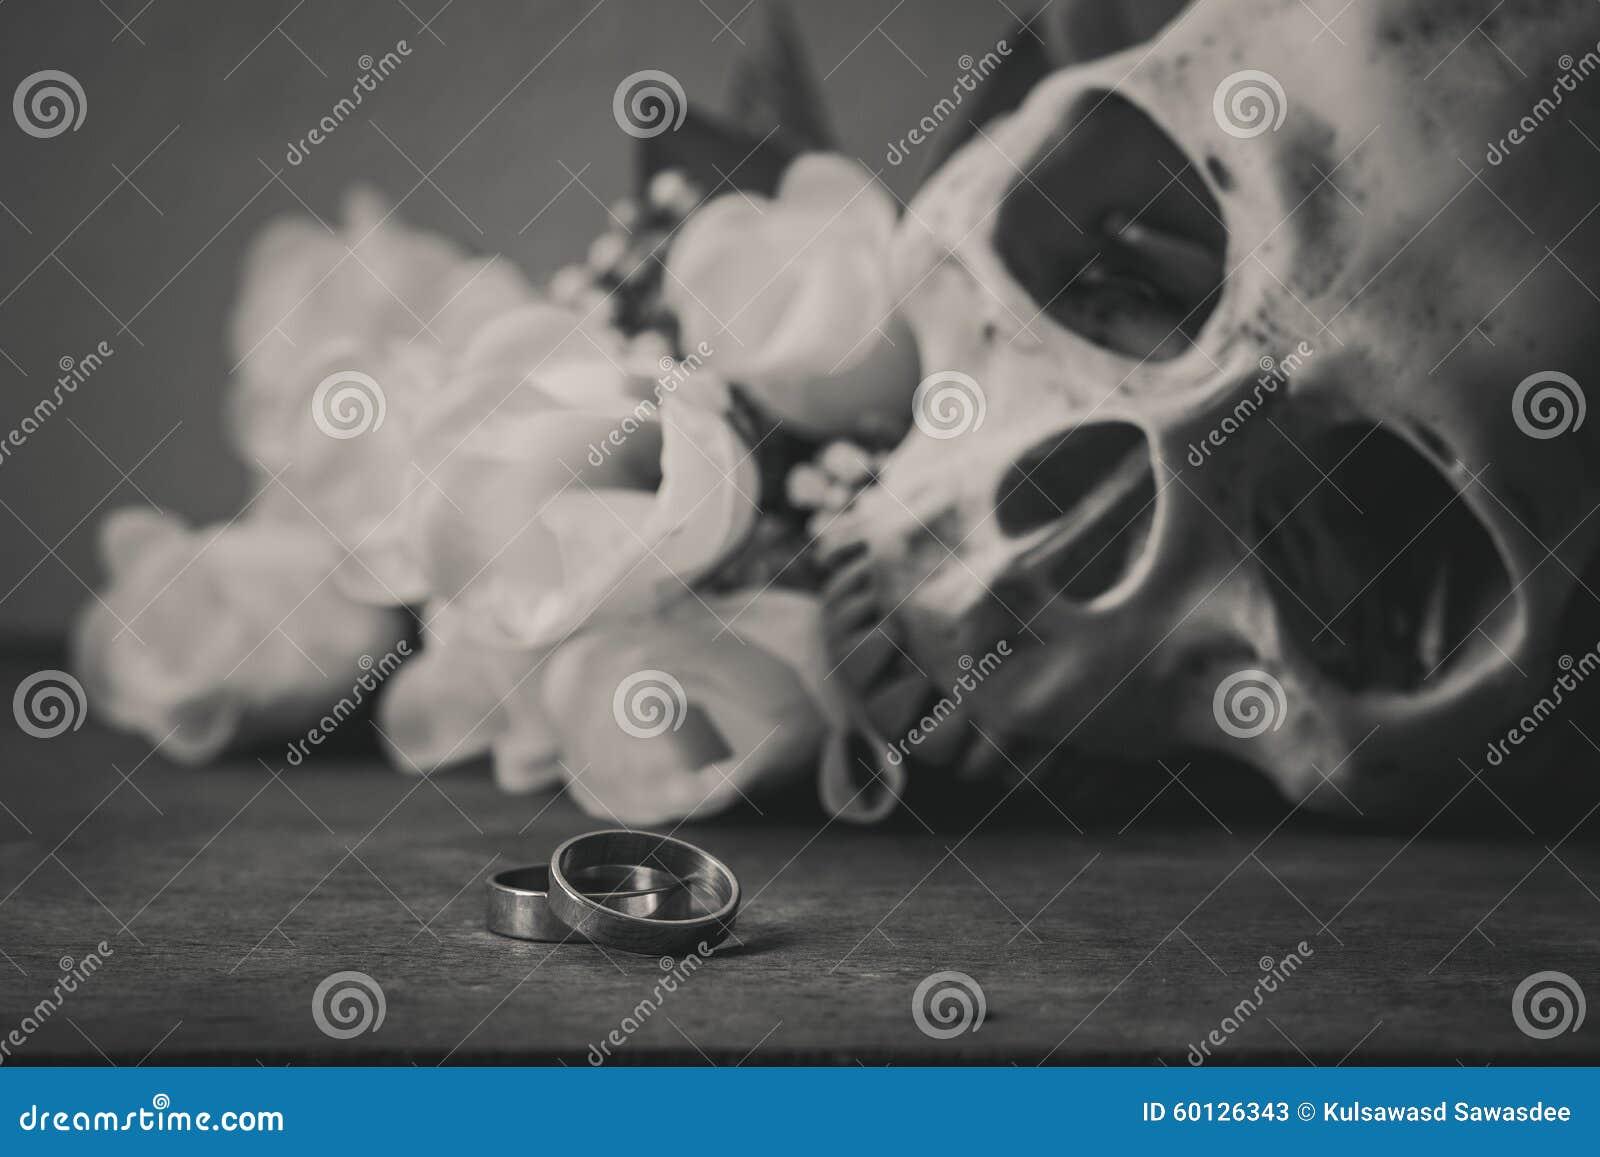 Creepy wedding rings